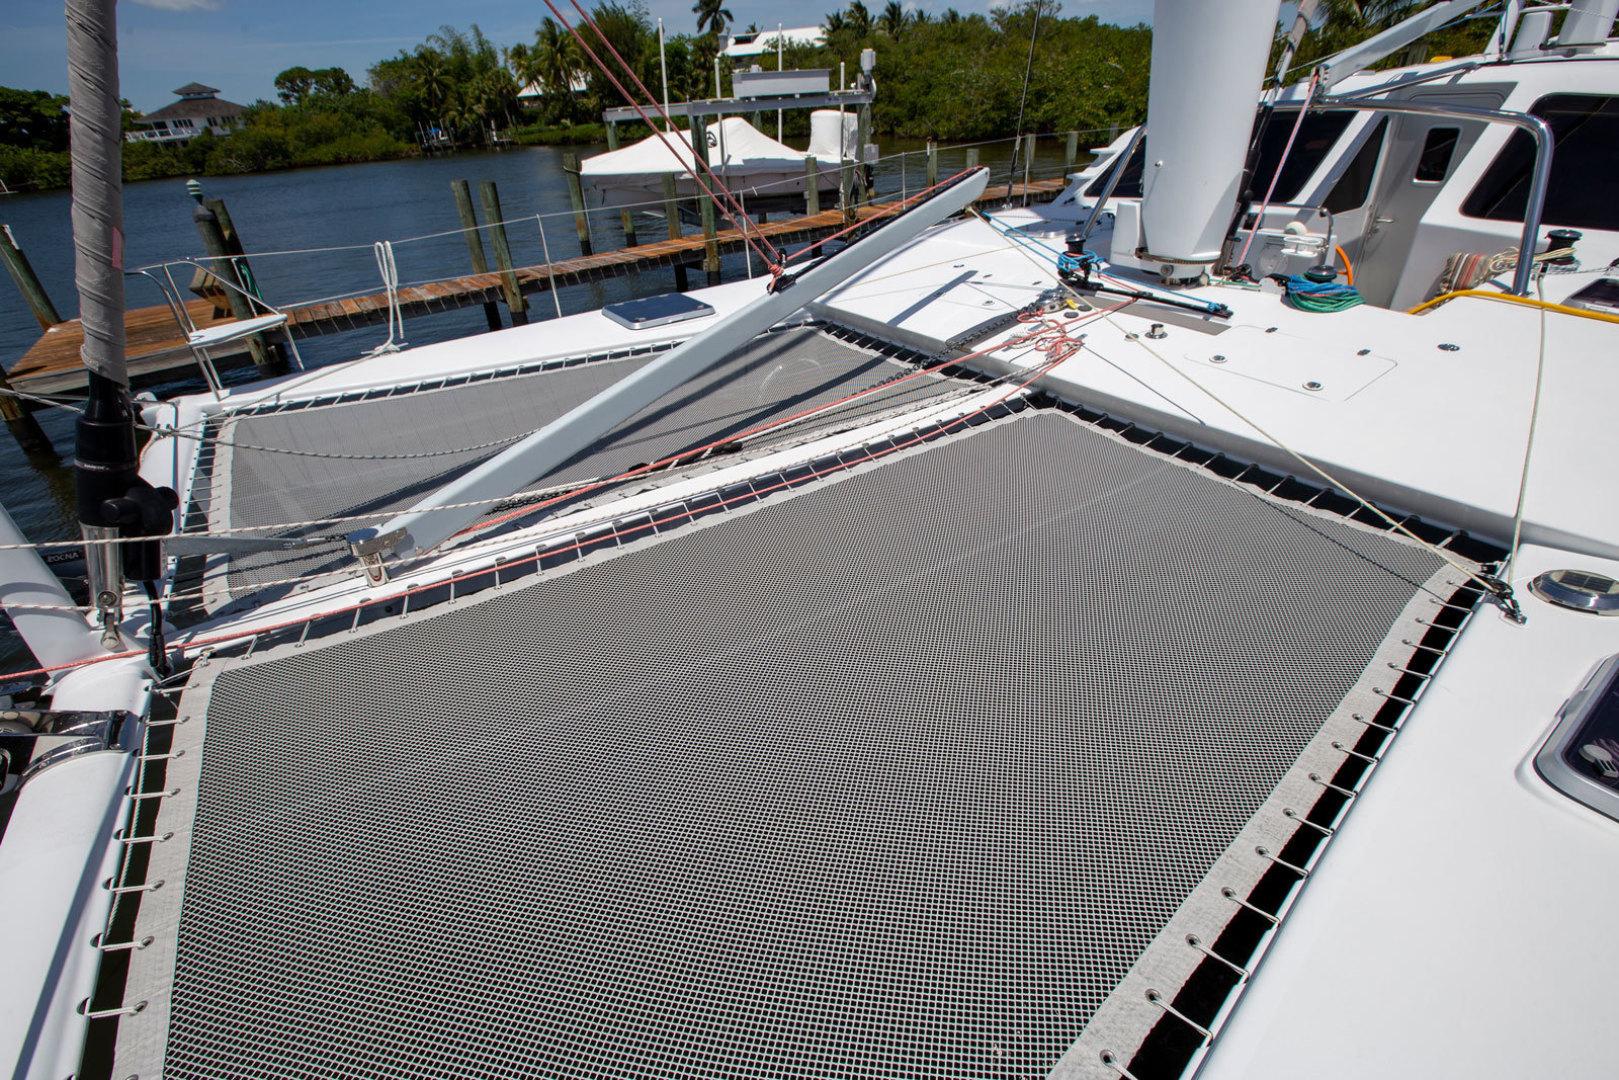 Atlantic-49 Catamaran 2018-Wabi Sabi Stuart-Florida-United States-1399304 | Thumbnail